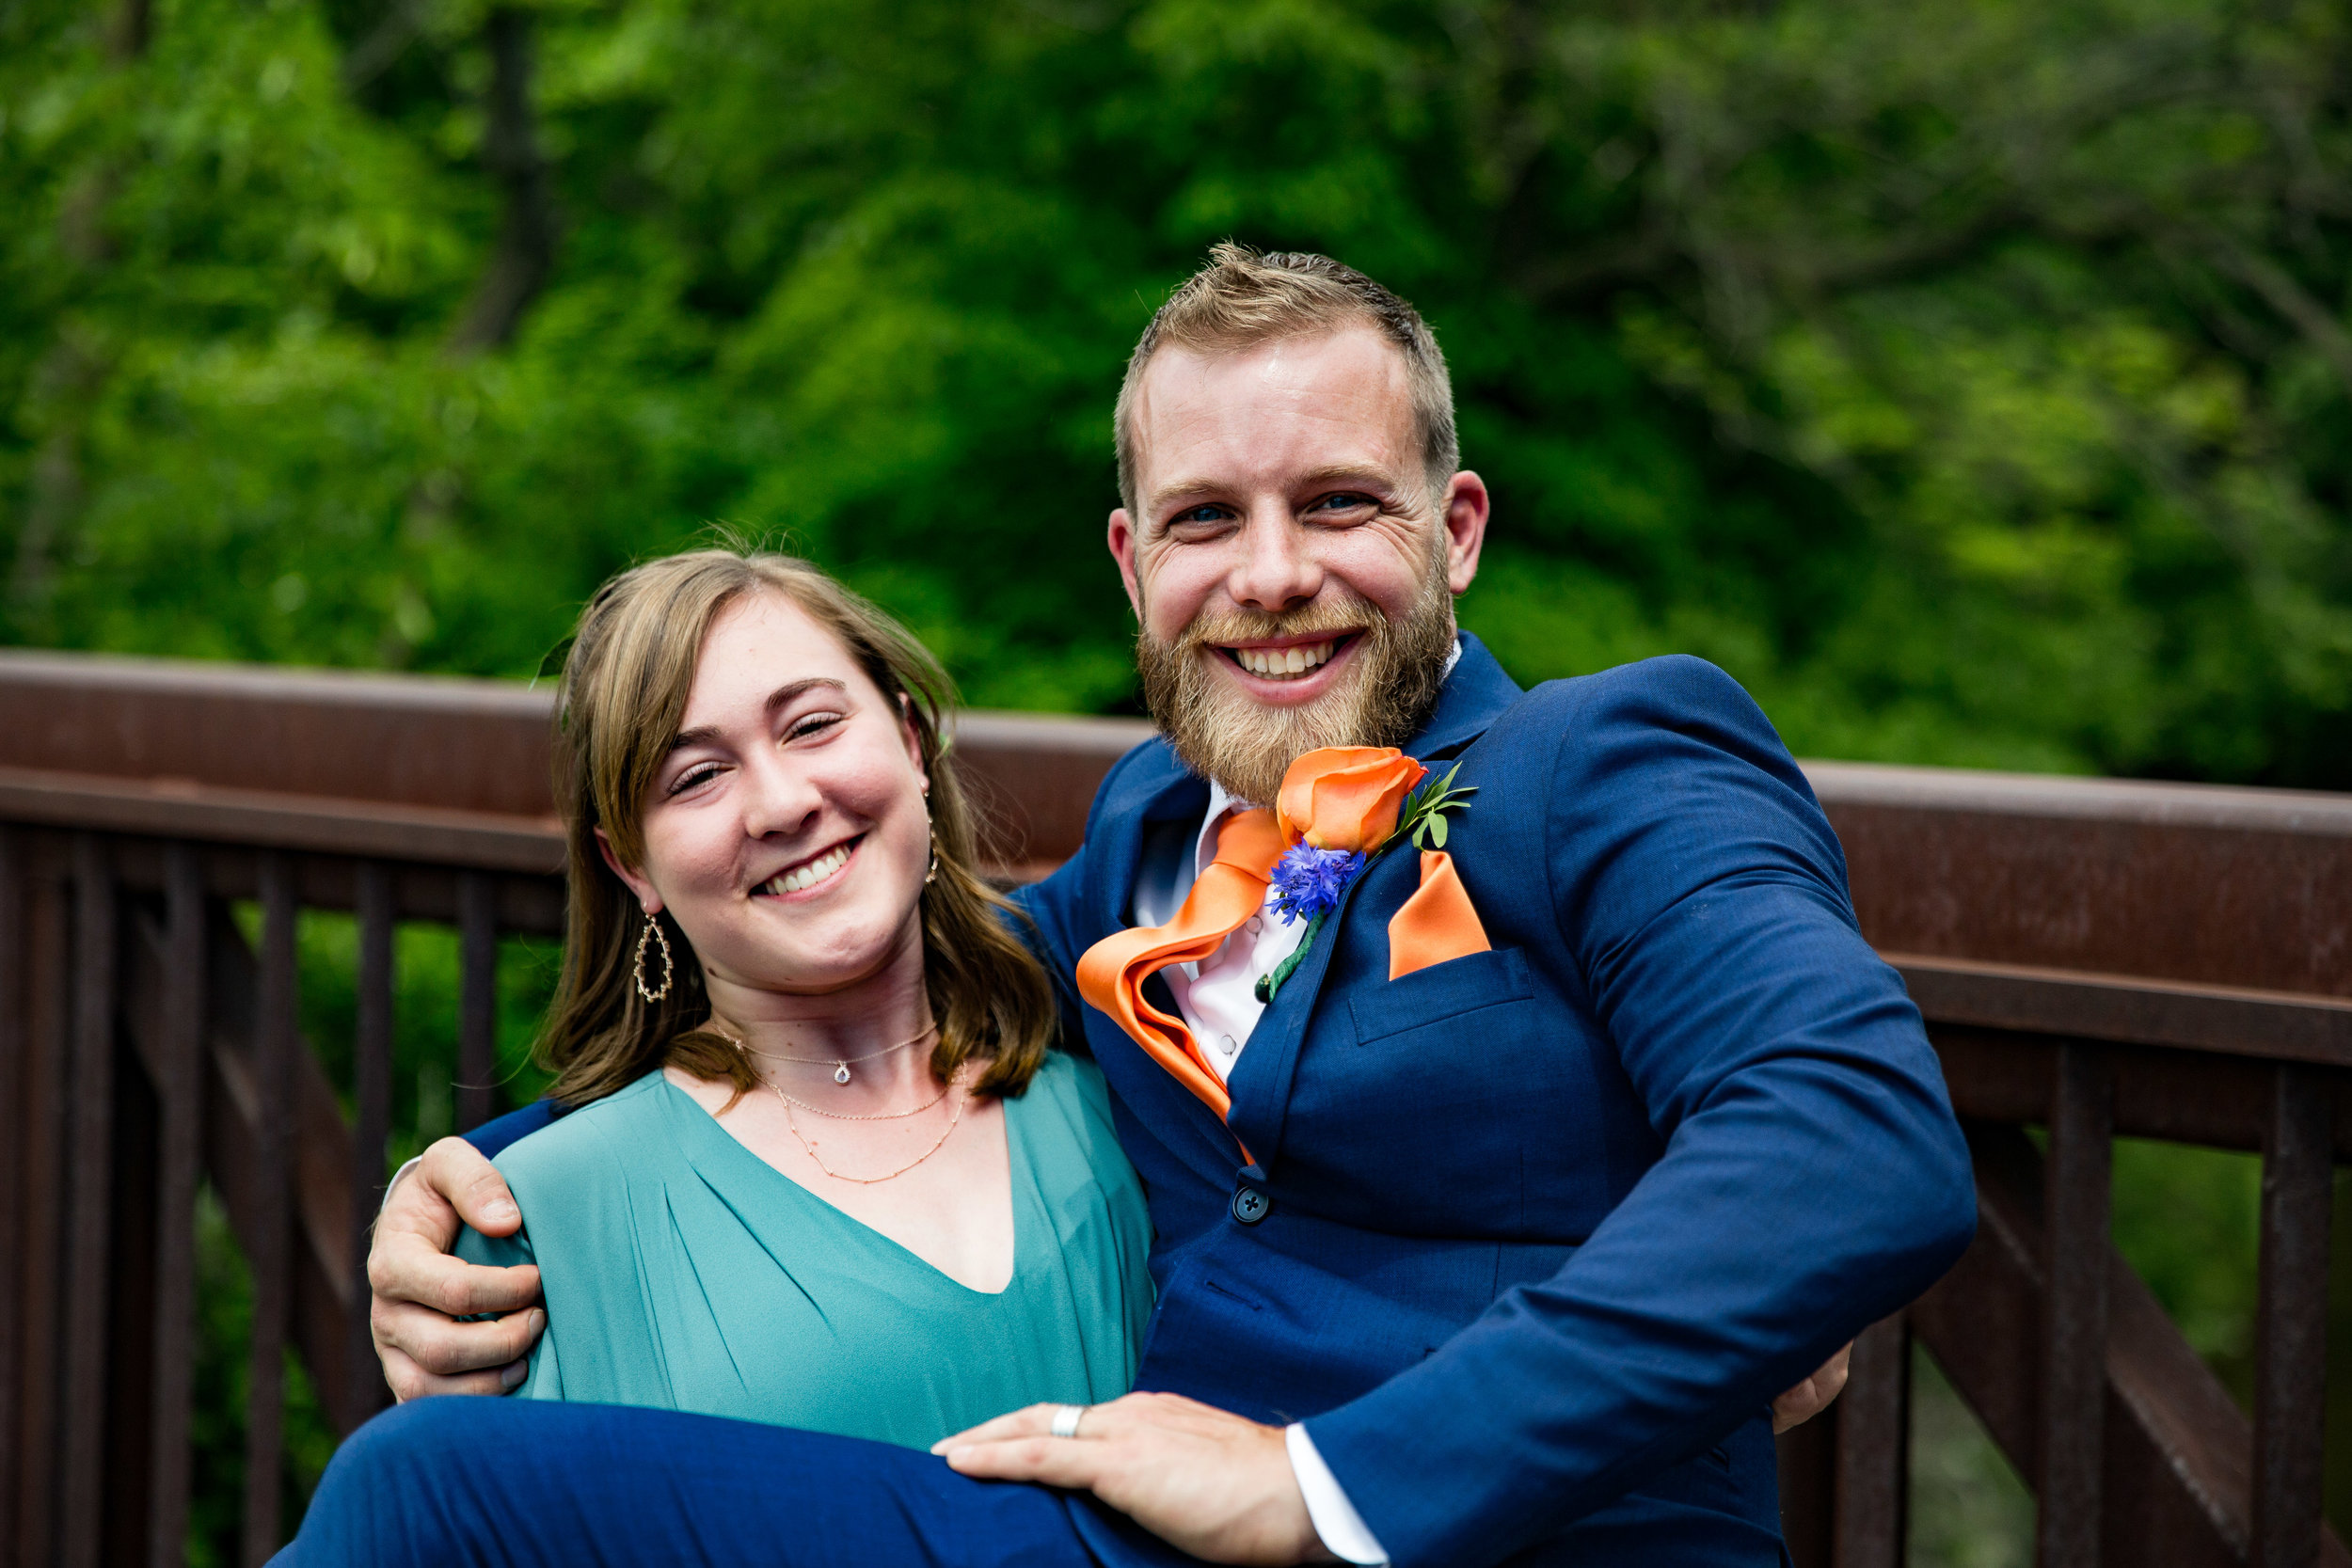 Natalie and Dallas Mooney Wedding 6-8-19_Tania Watt Photography-260.jpg